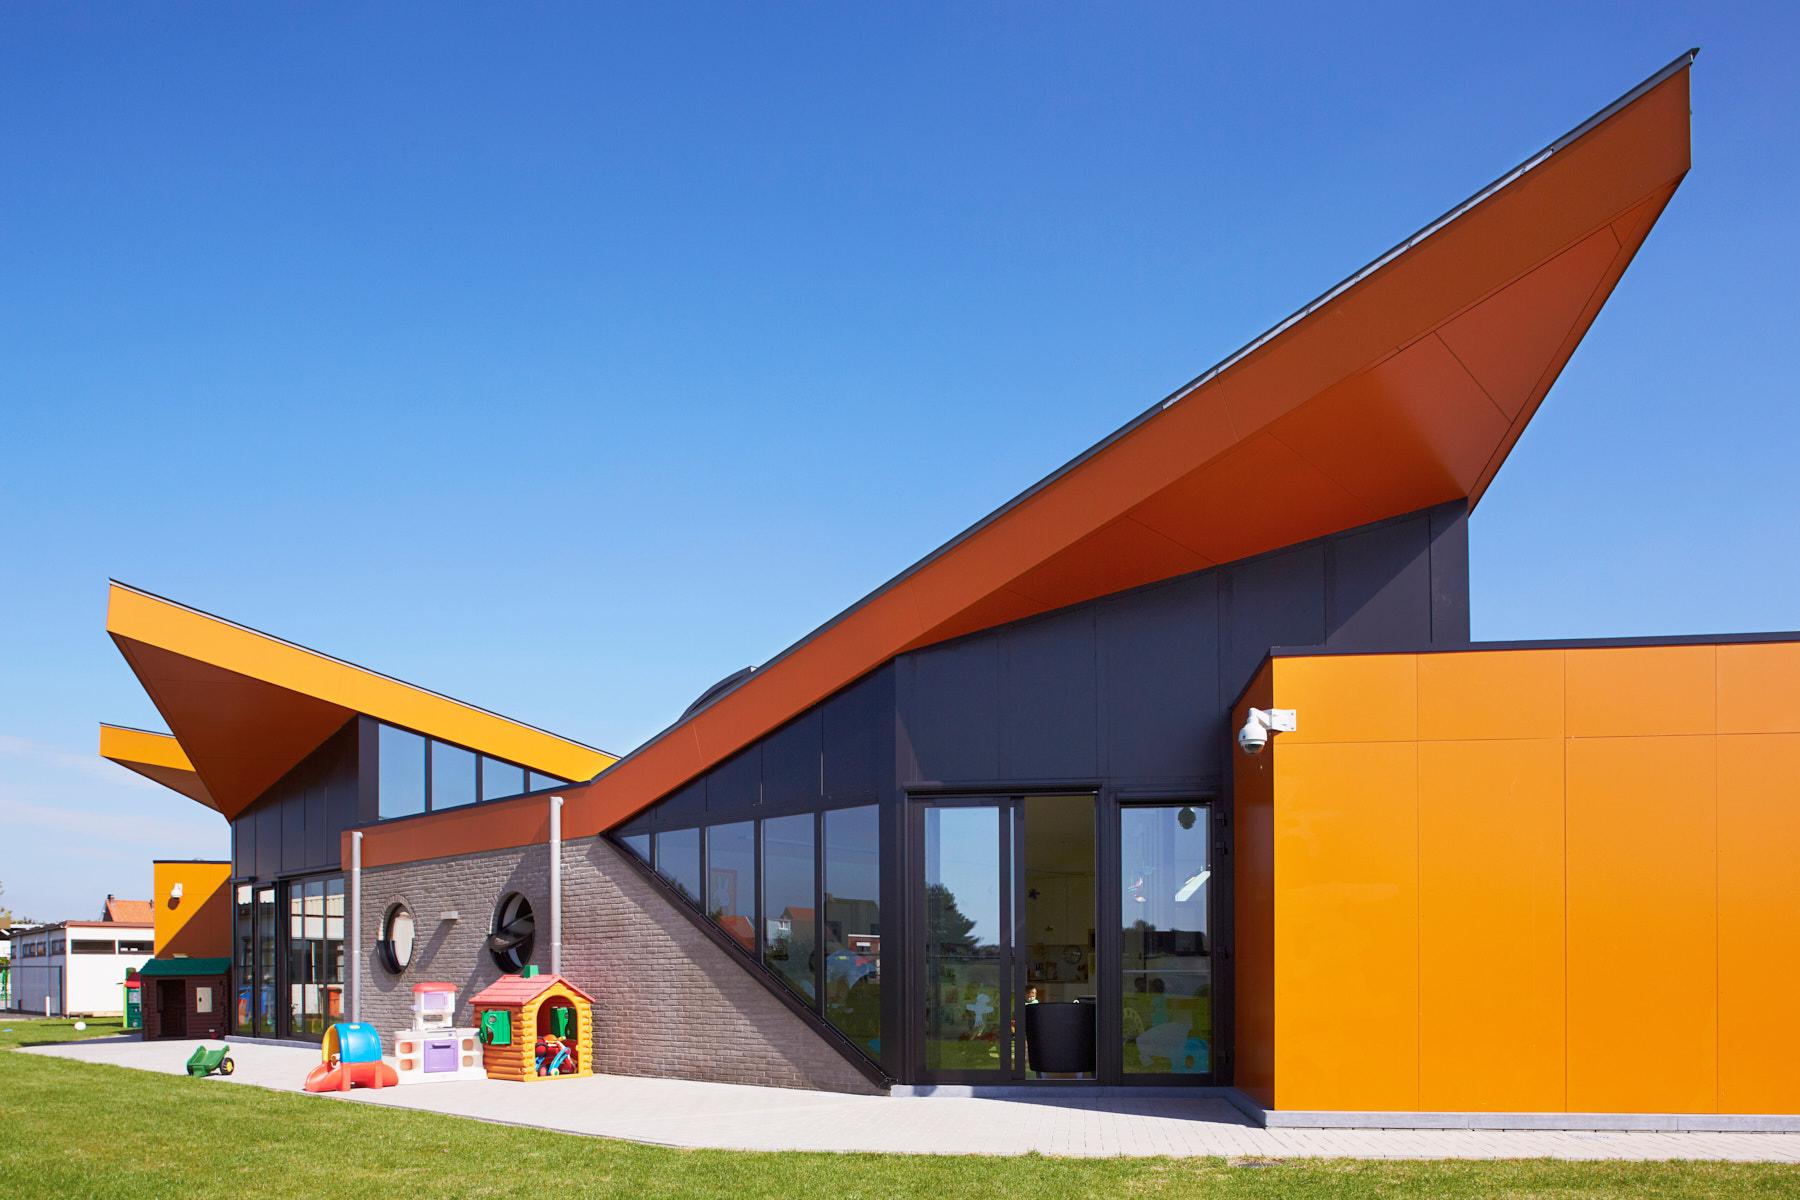 Portfolio architectuur en interieur fotografie u2014 dimitri janssens